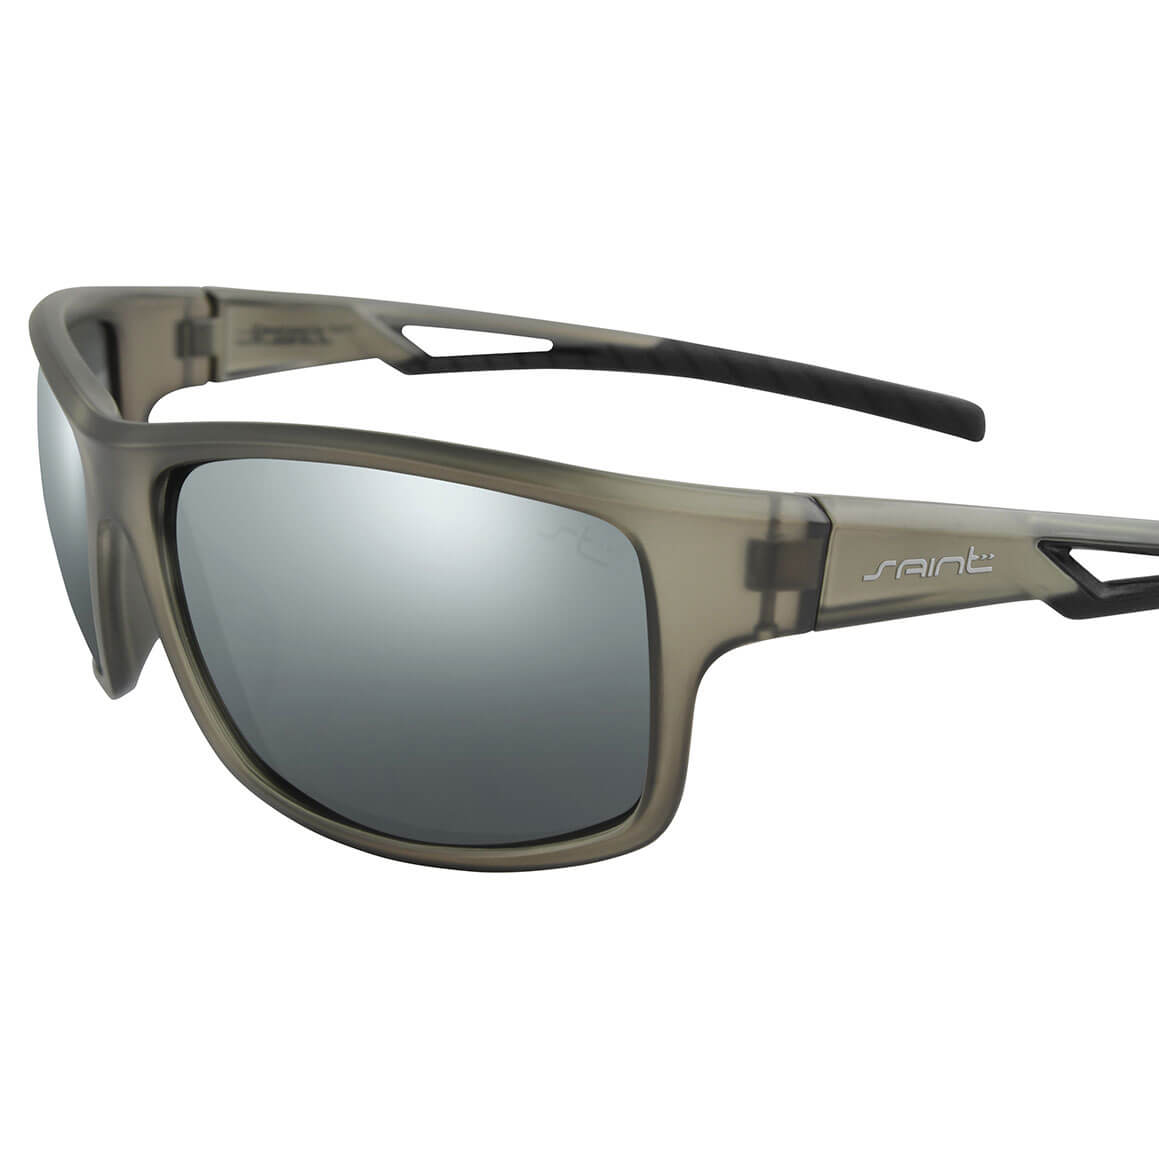 Óculos Polarizado Saint Plus Fluence Black  - Pró Pesca Shop